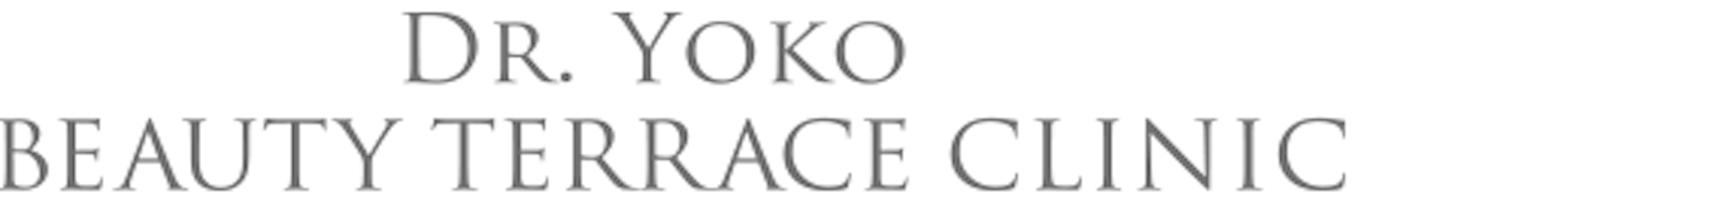 Dr. YOKO BEAUTY TERRACE CLINICロゴ